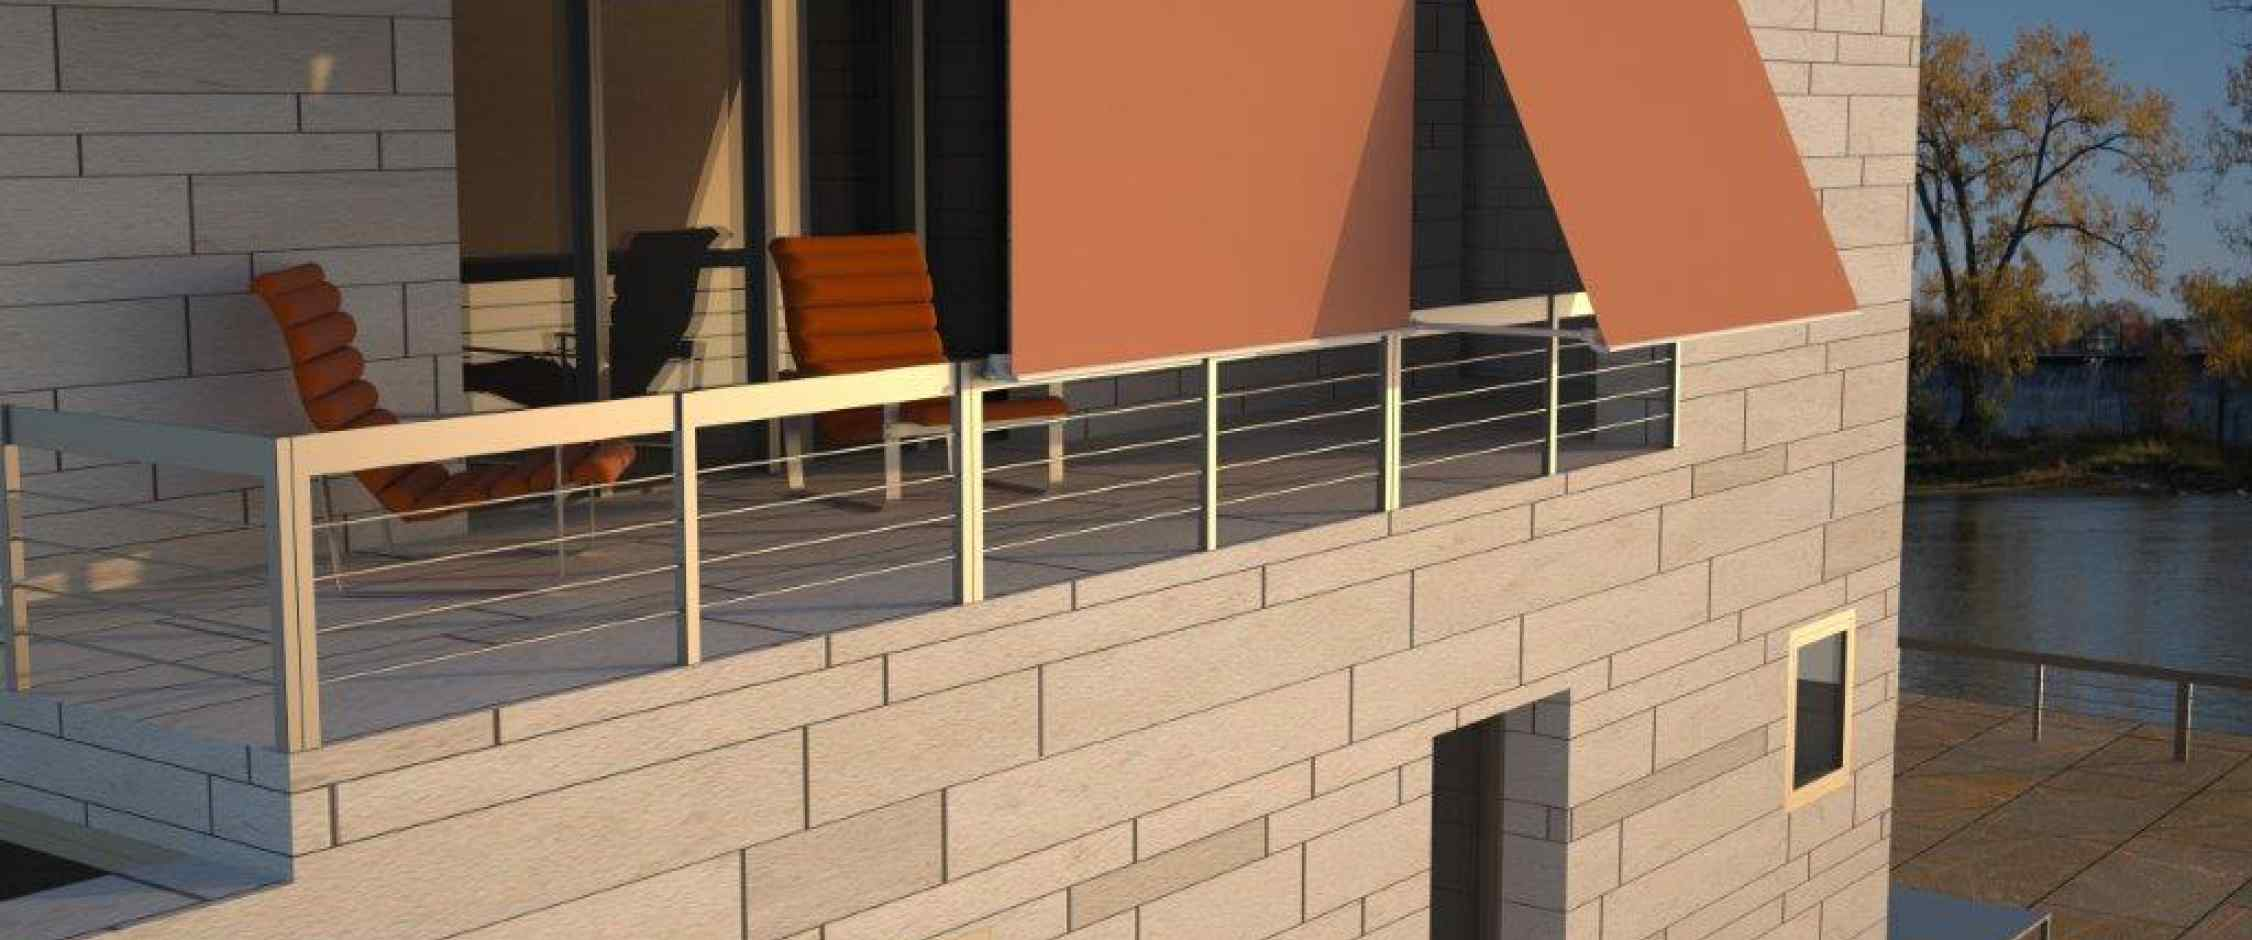 Toldo sistema brazo stor con cofre de protección Desert especifico para terrazas con baranda funcionamiento manual o eléctrico.